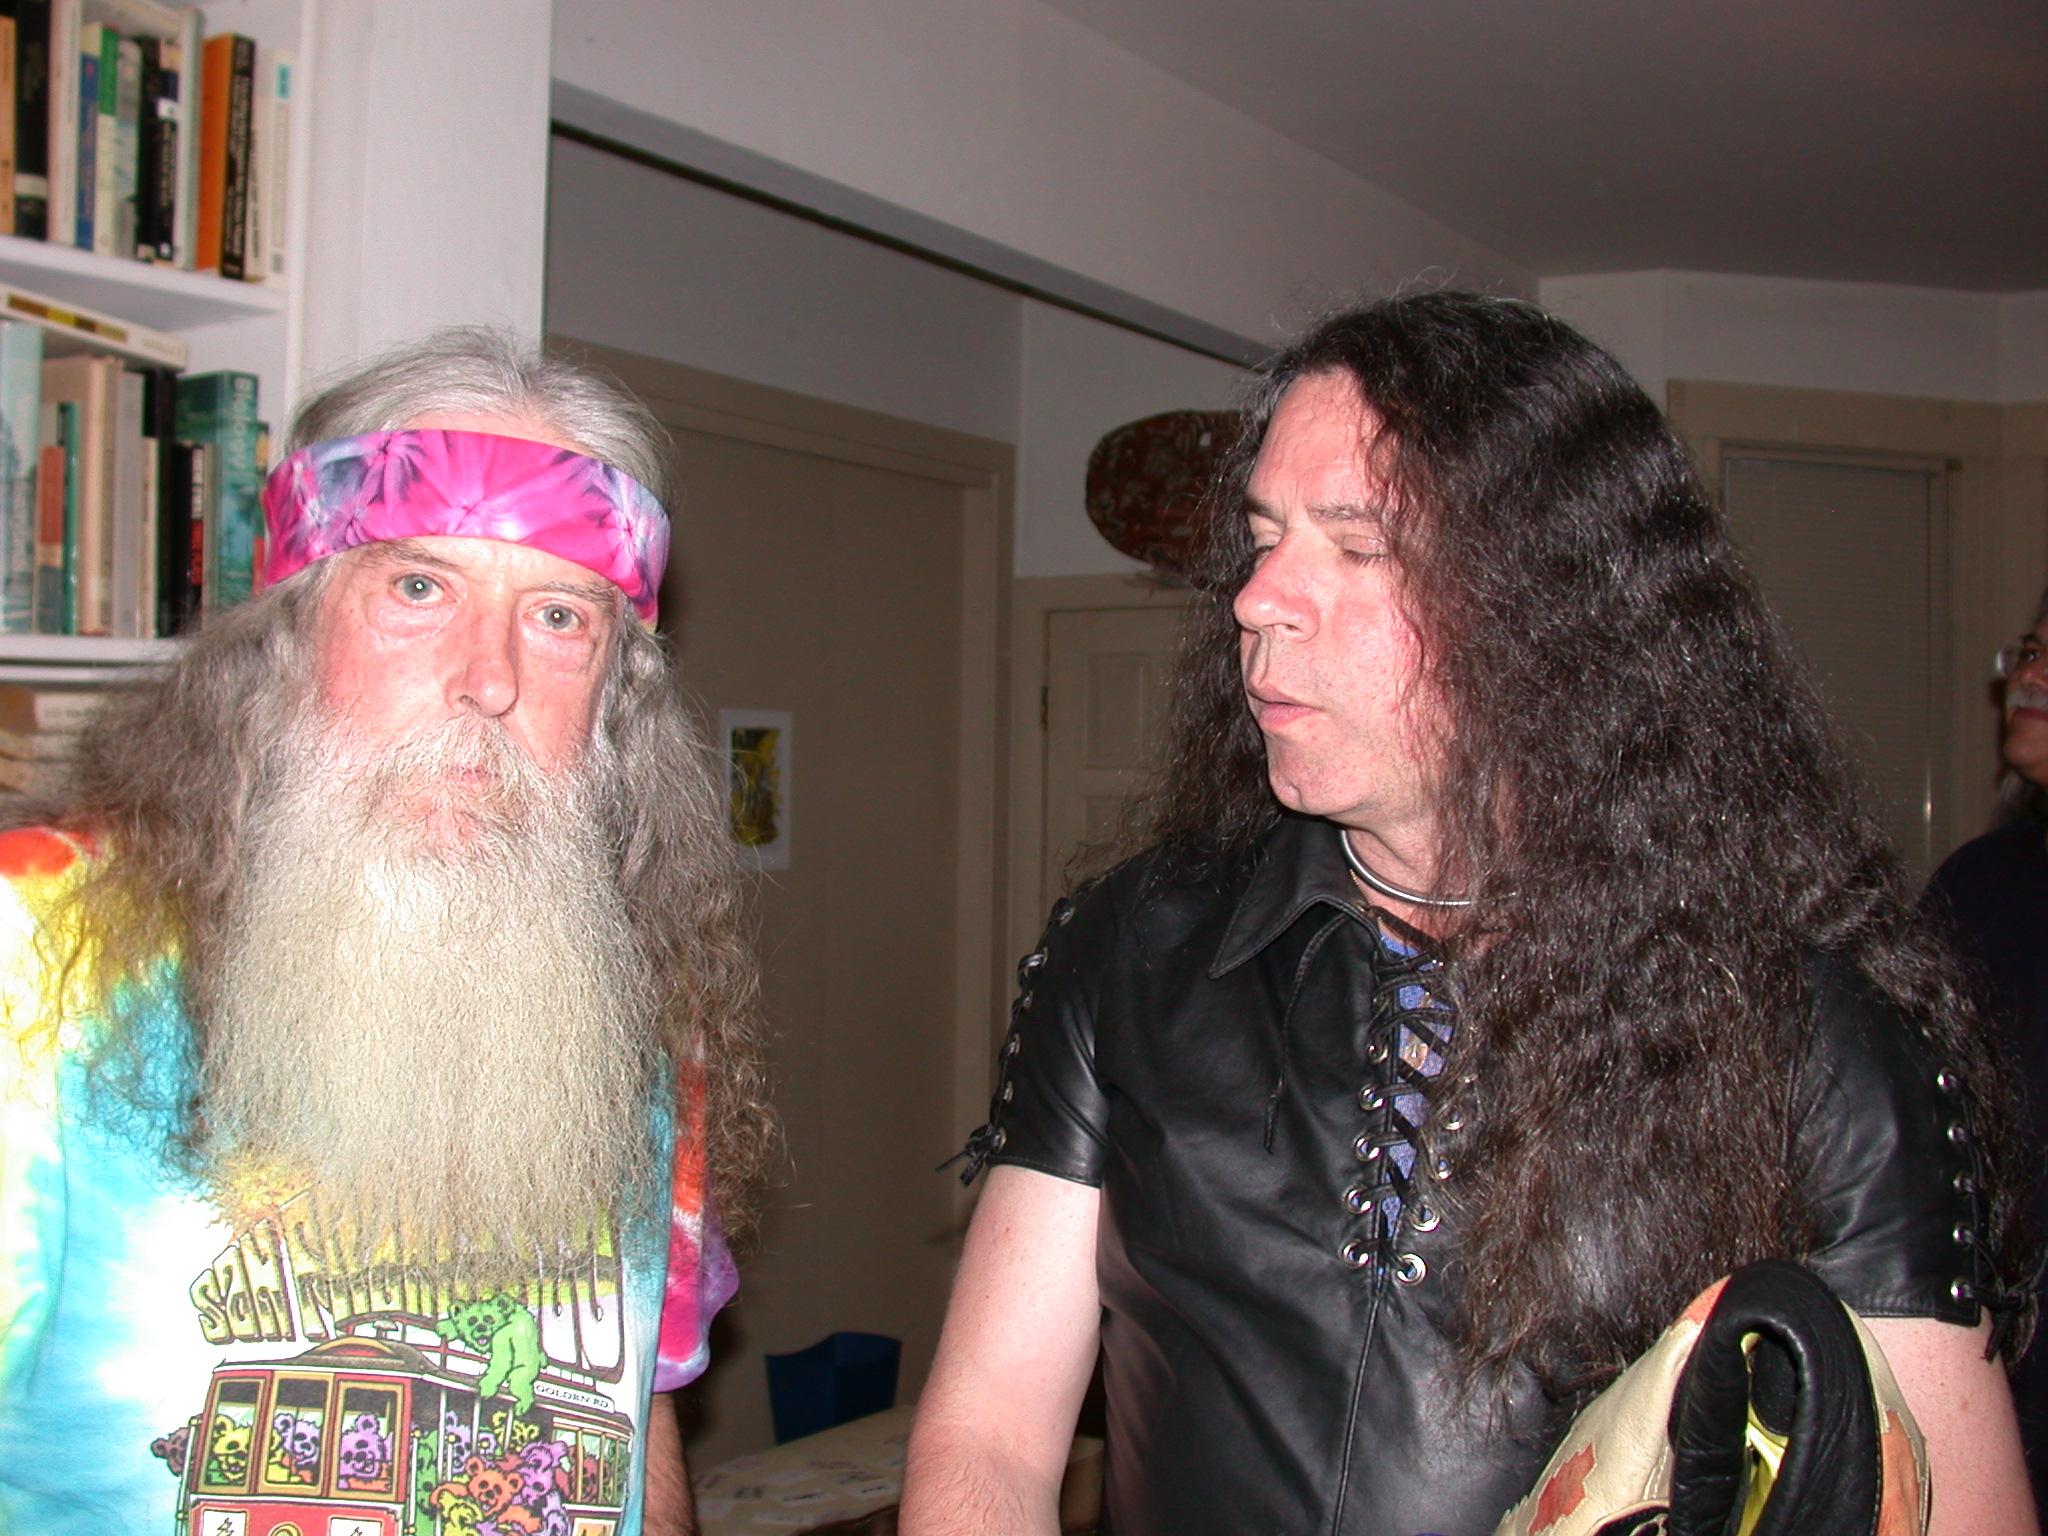 Bill and Bryan